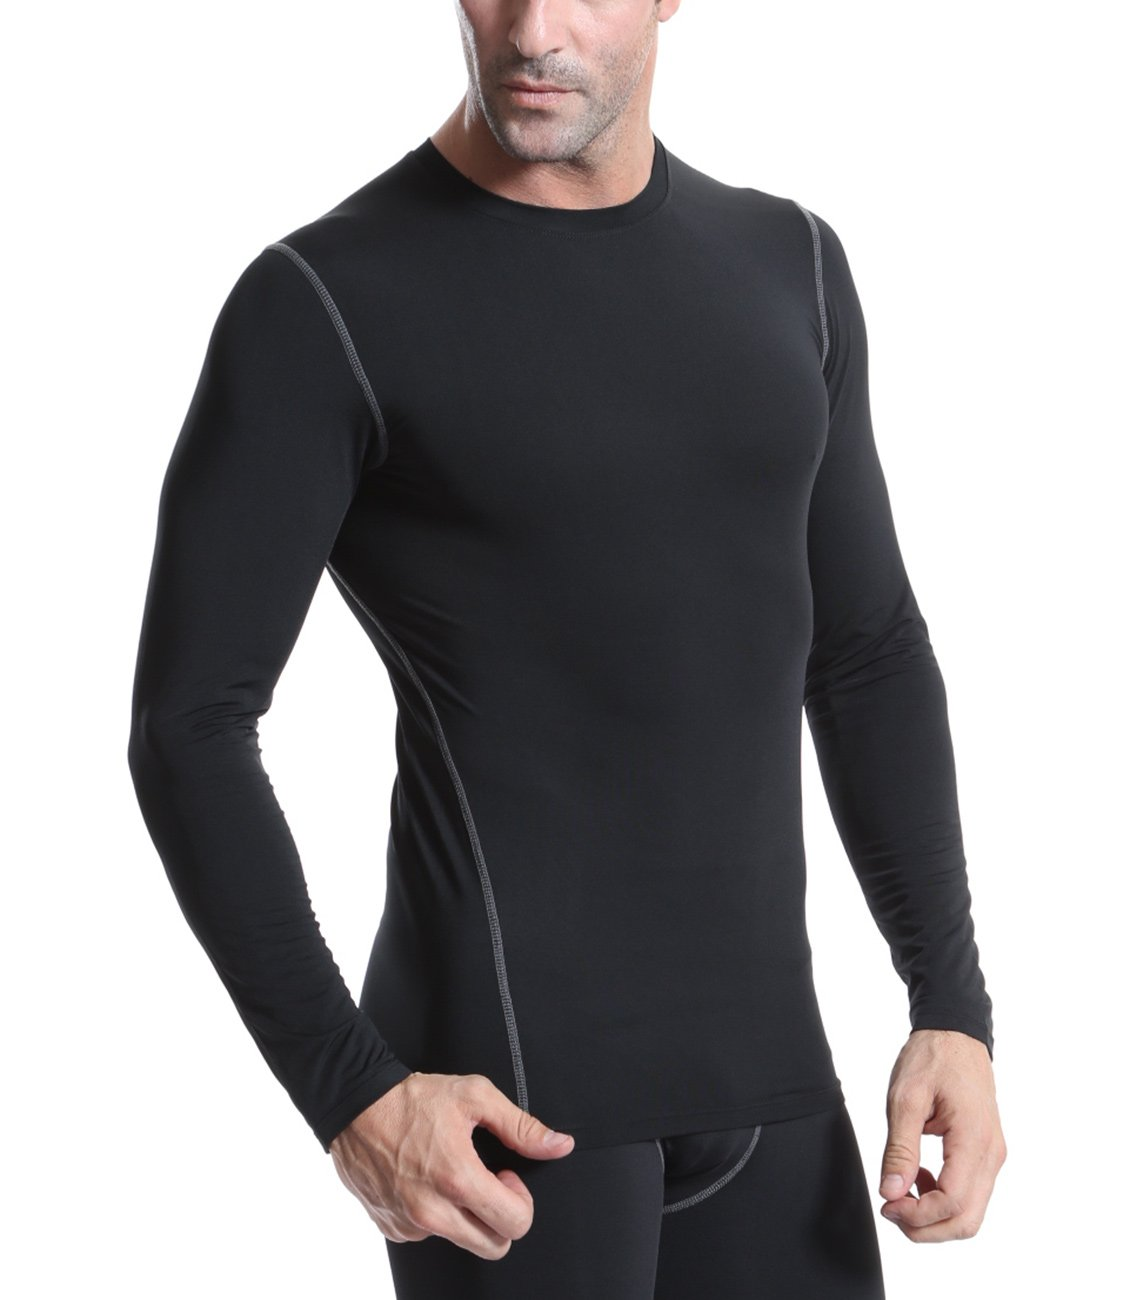 Yuerlian Men Compression Shirts Long Sleeve Thermal Baselayer Coldgera Running Shirts